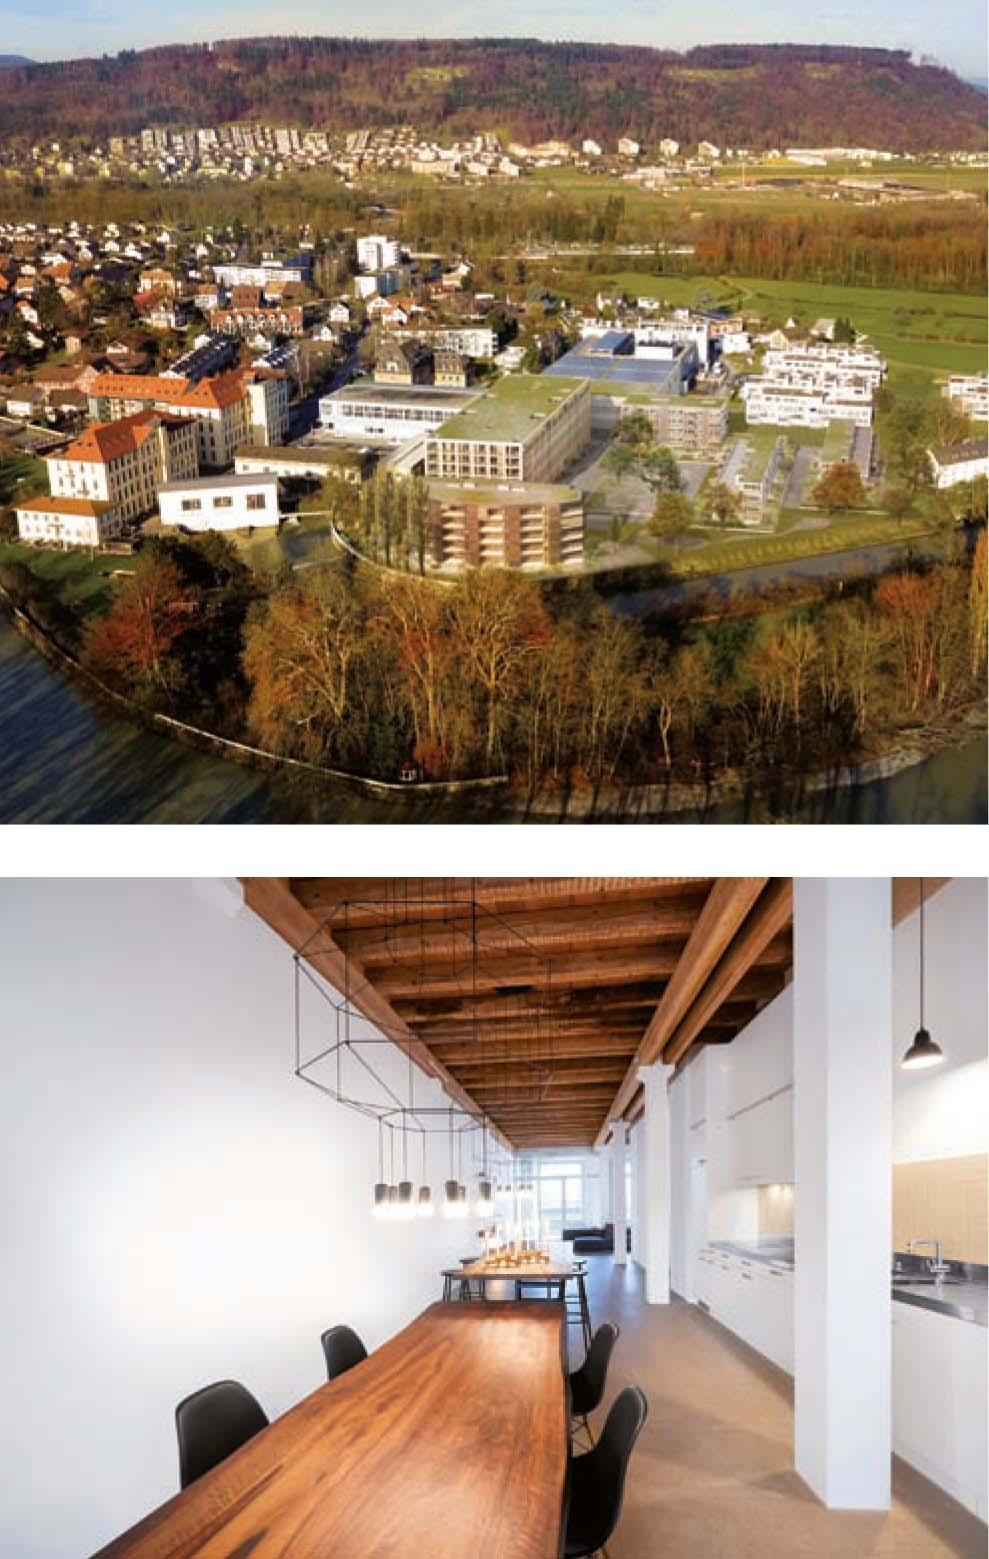 Wohnrevue_Mia Kepenek_Staging_Windisch Loft HIAG Immobilien_01.jpg